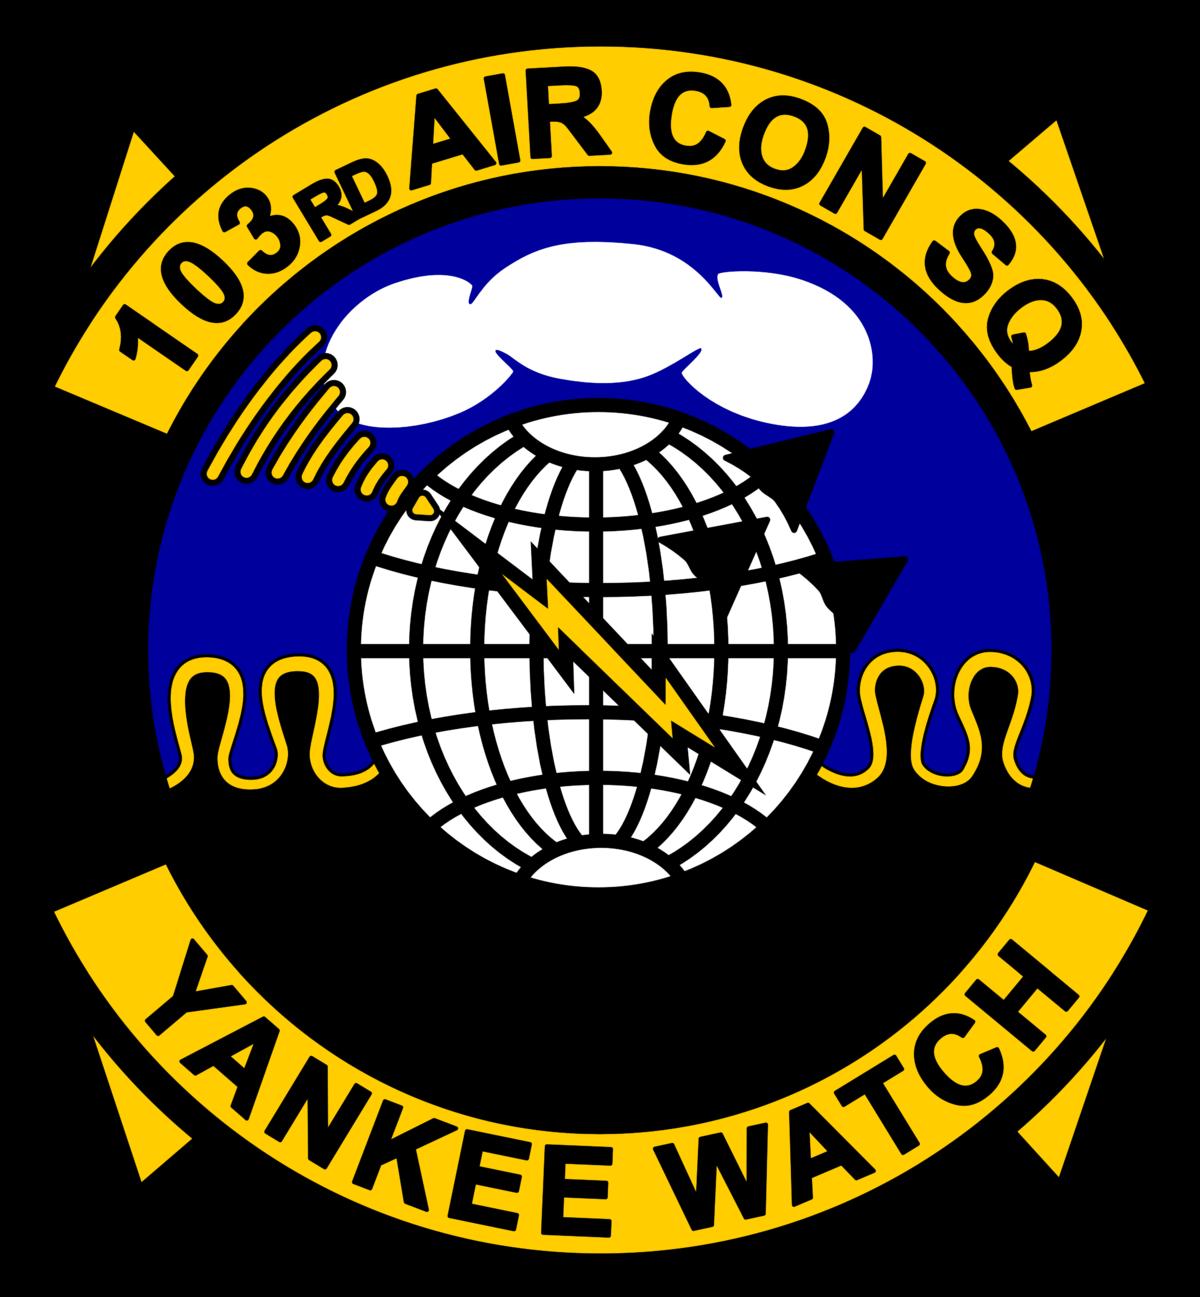 103rd Air Control Squadron - Wikipedia